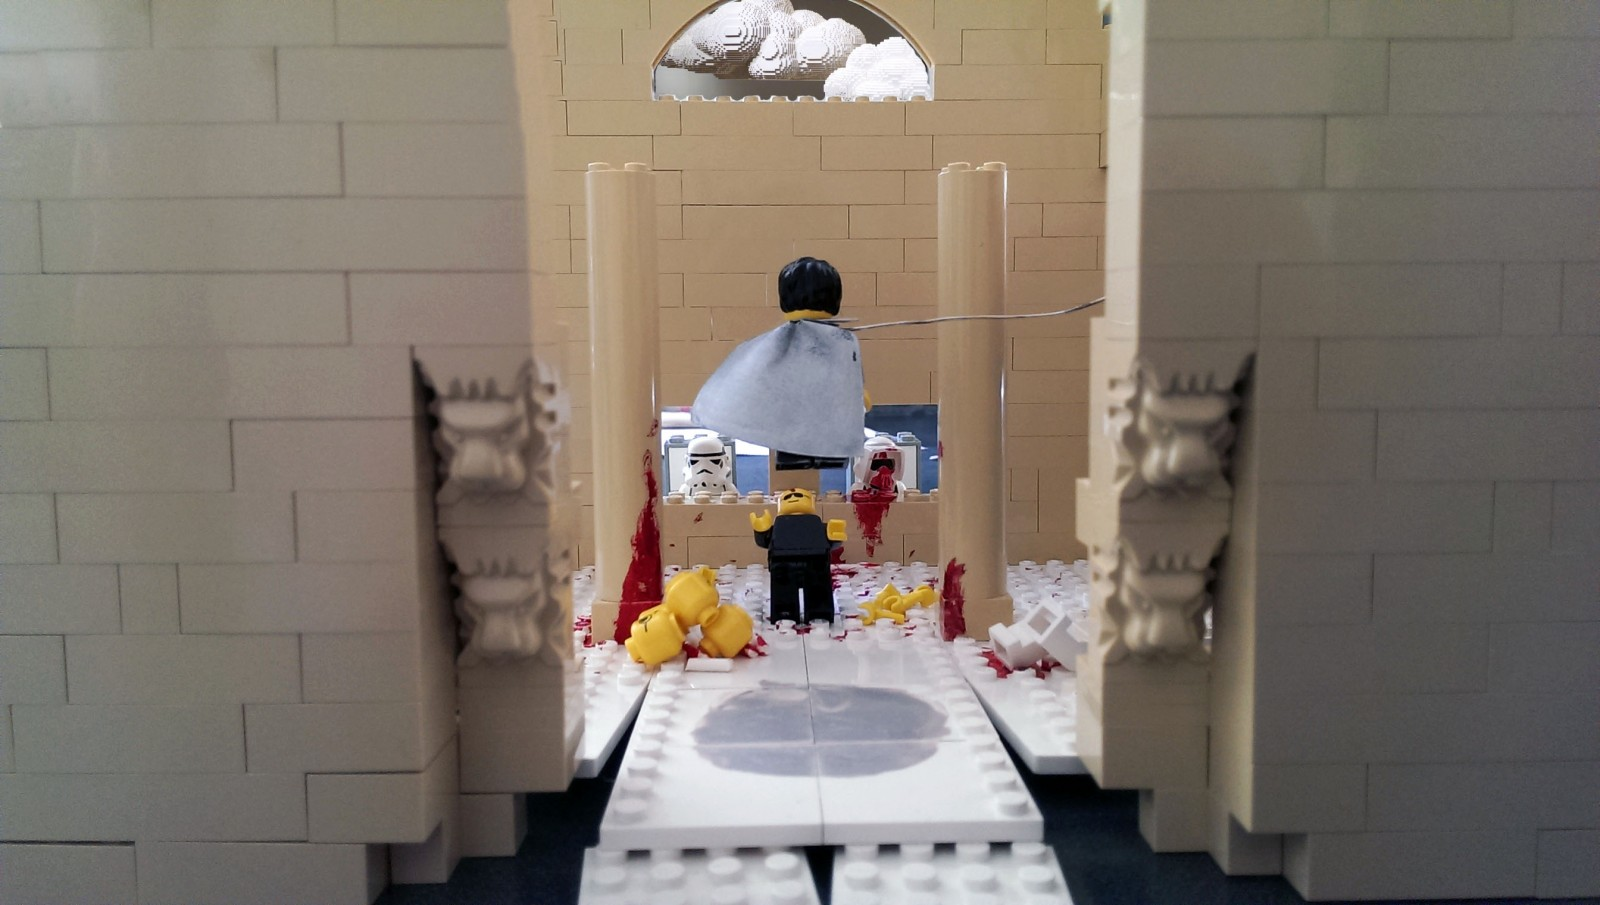 Legoheart vs Deathlego